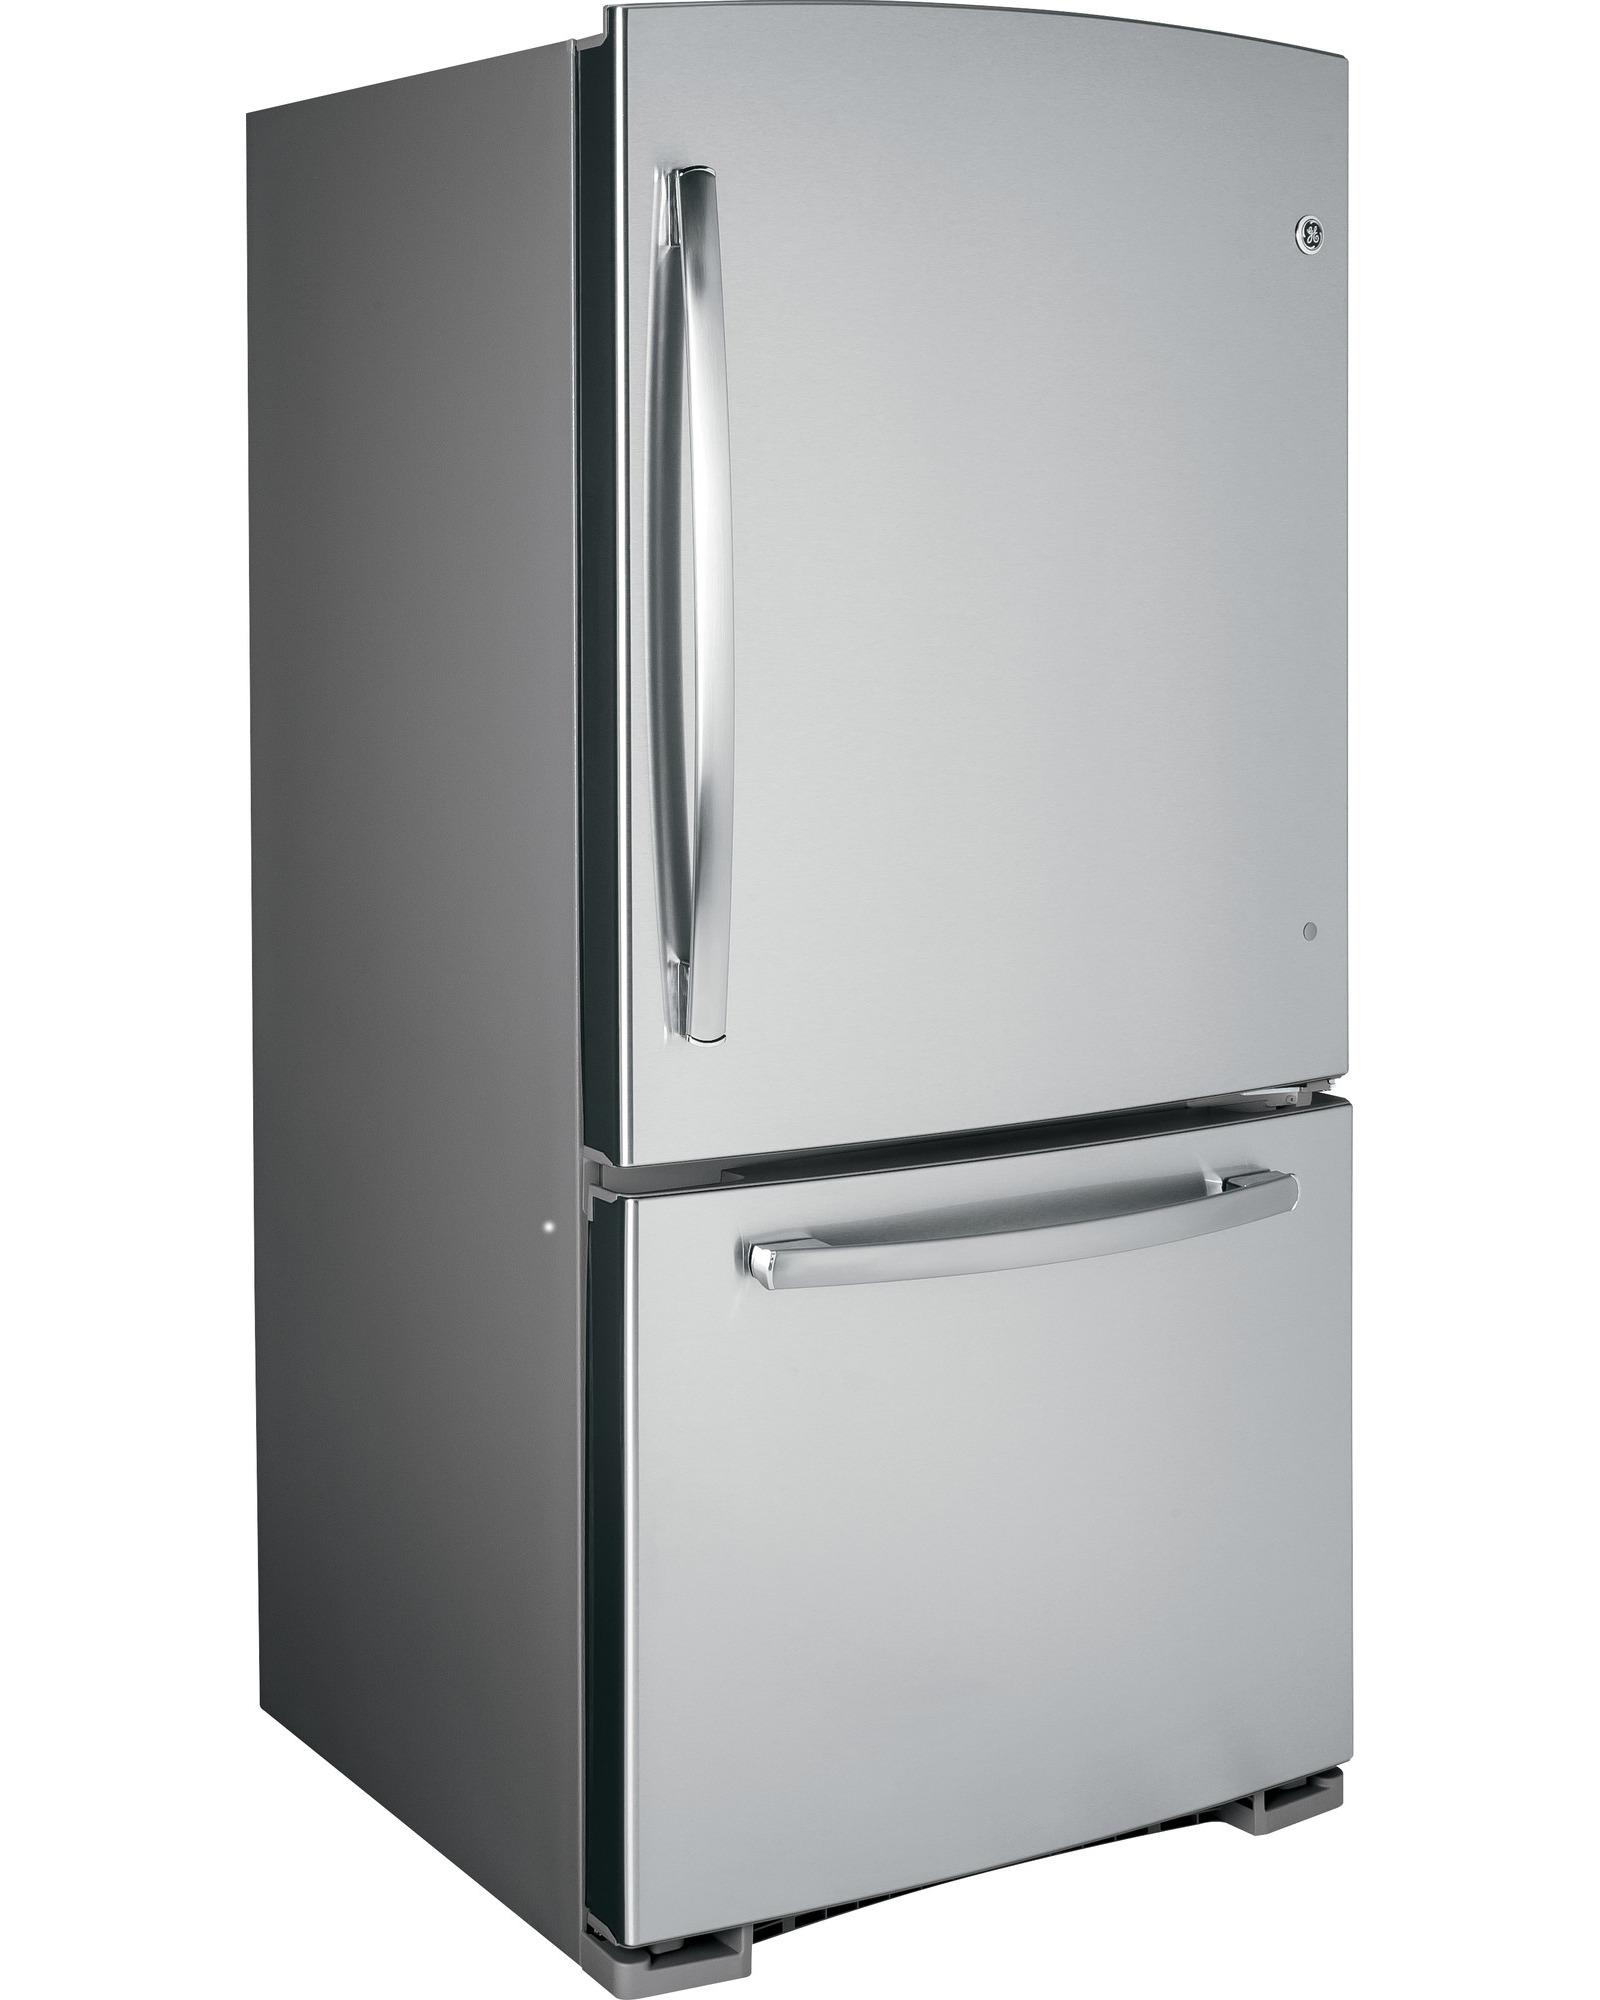 GE Appliances GBS20ESHSS 20.3 cu. ft. Bottom-Freezer Refrigerator - Stainless Steel